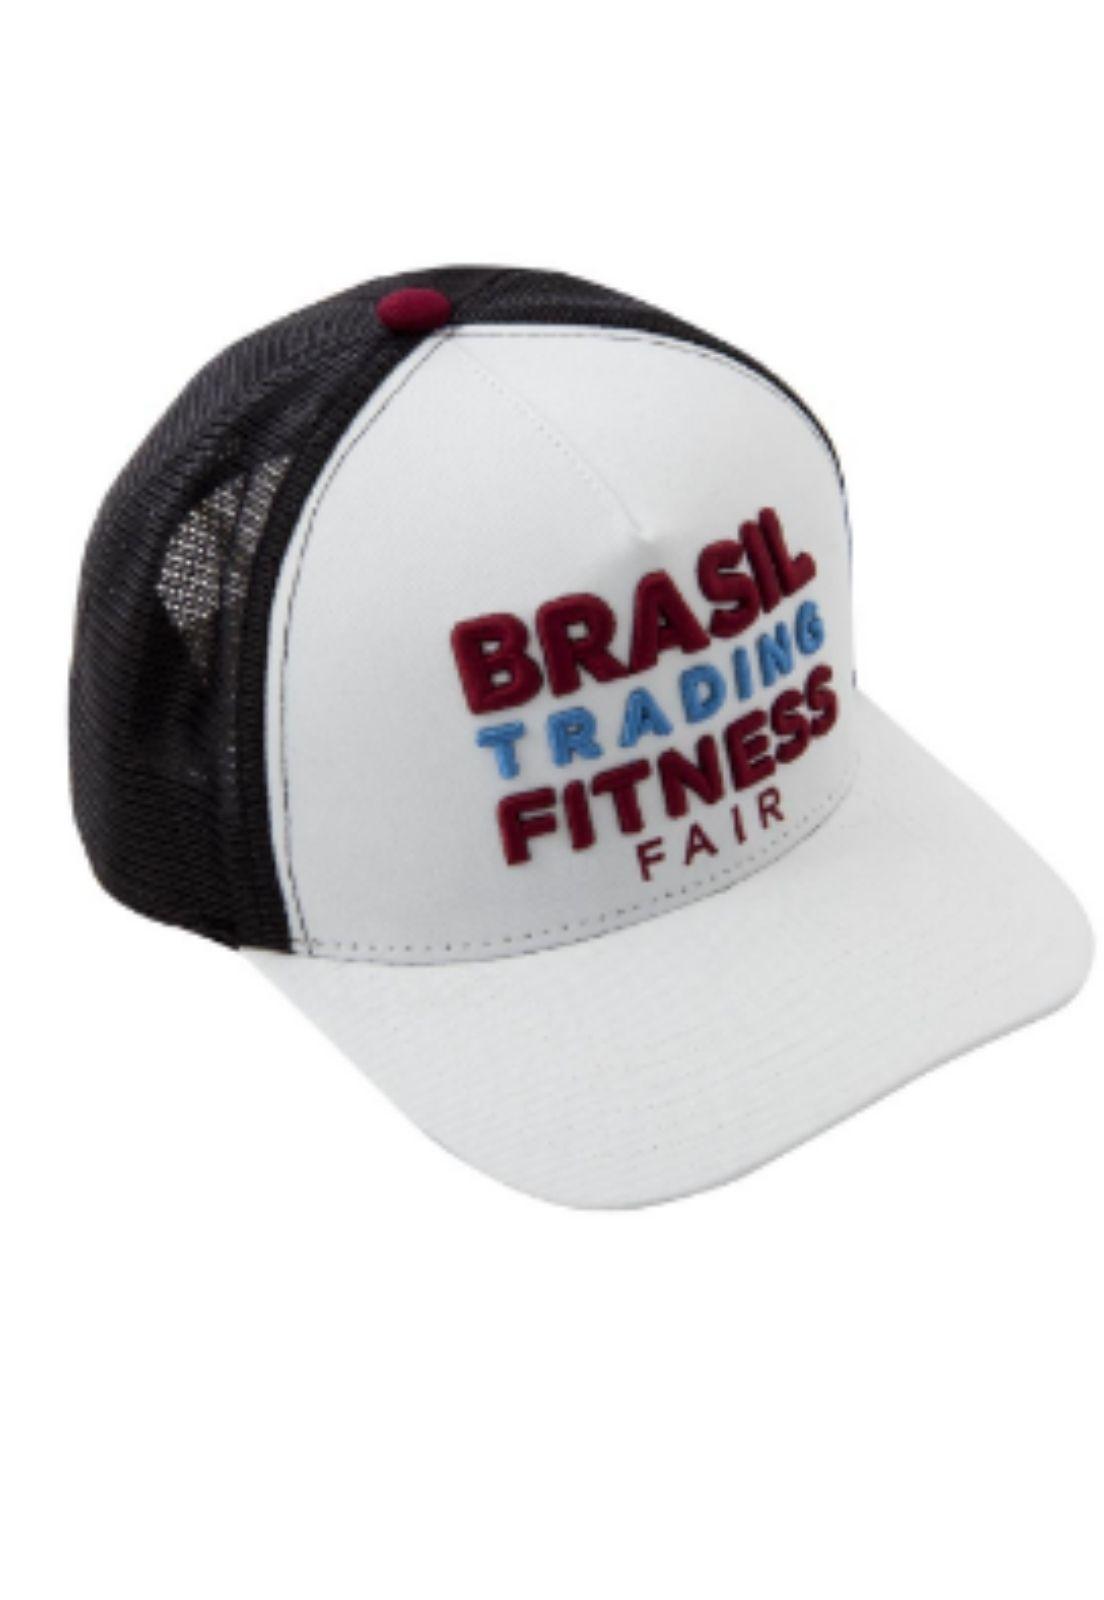 Boné Brasil Trading Fitness - B46827  - CROCKER JEANS